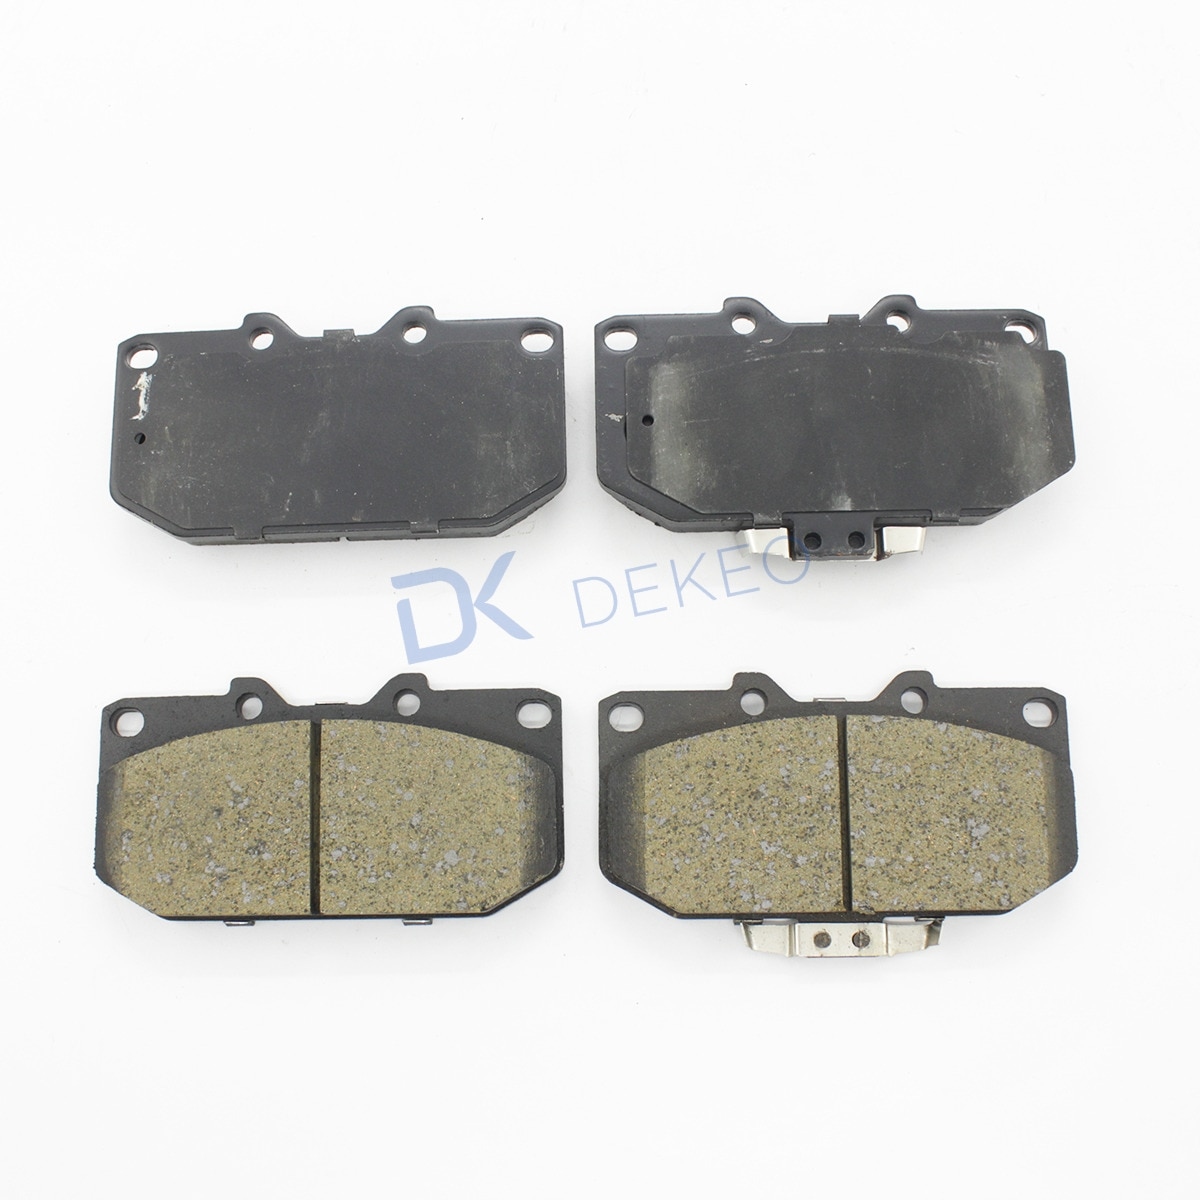 DEKEO автомобильные тормозные колодки передние для Nissan 300ZX (Z31) (Z32) 3.0L Subaru Impreza (WRX) 2,0 T (Segment WRX STi) 2,0 T 2,5 T 4 шт